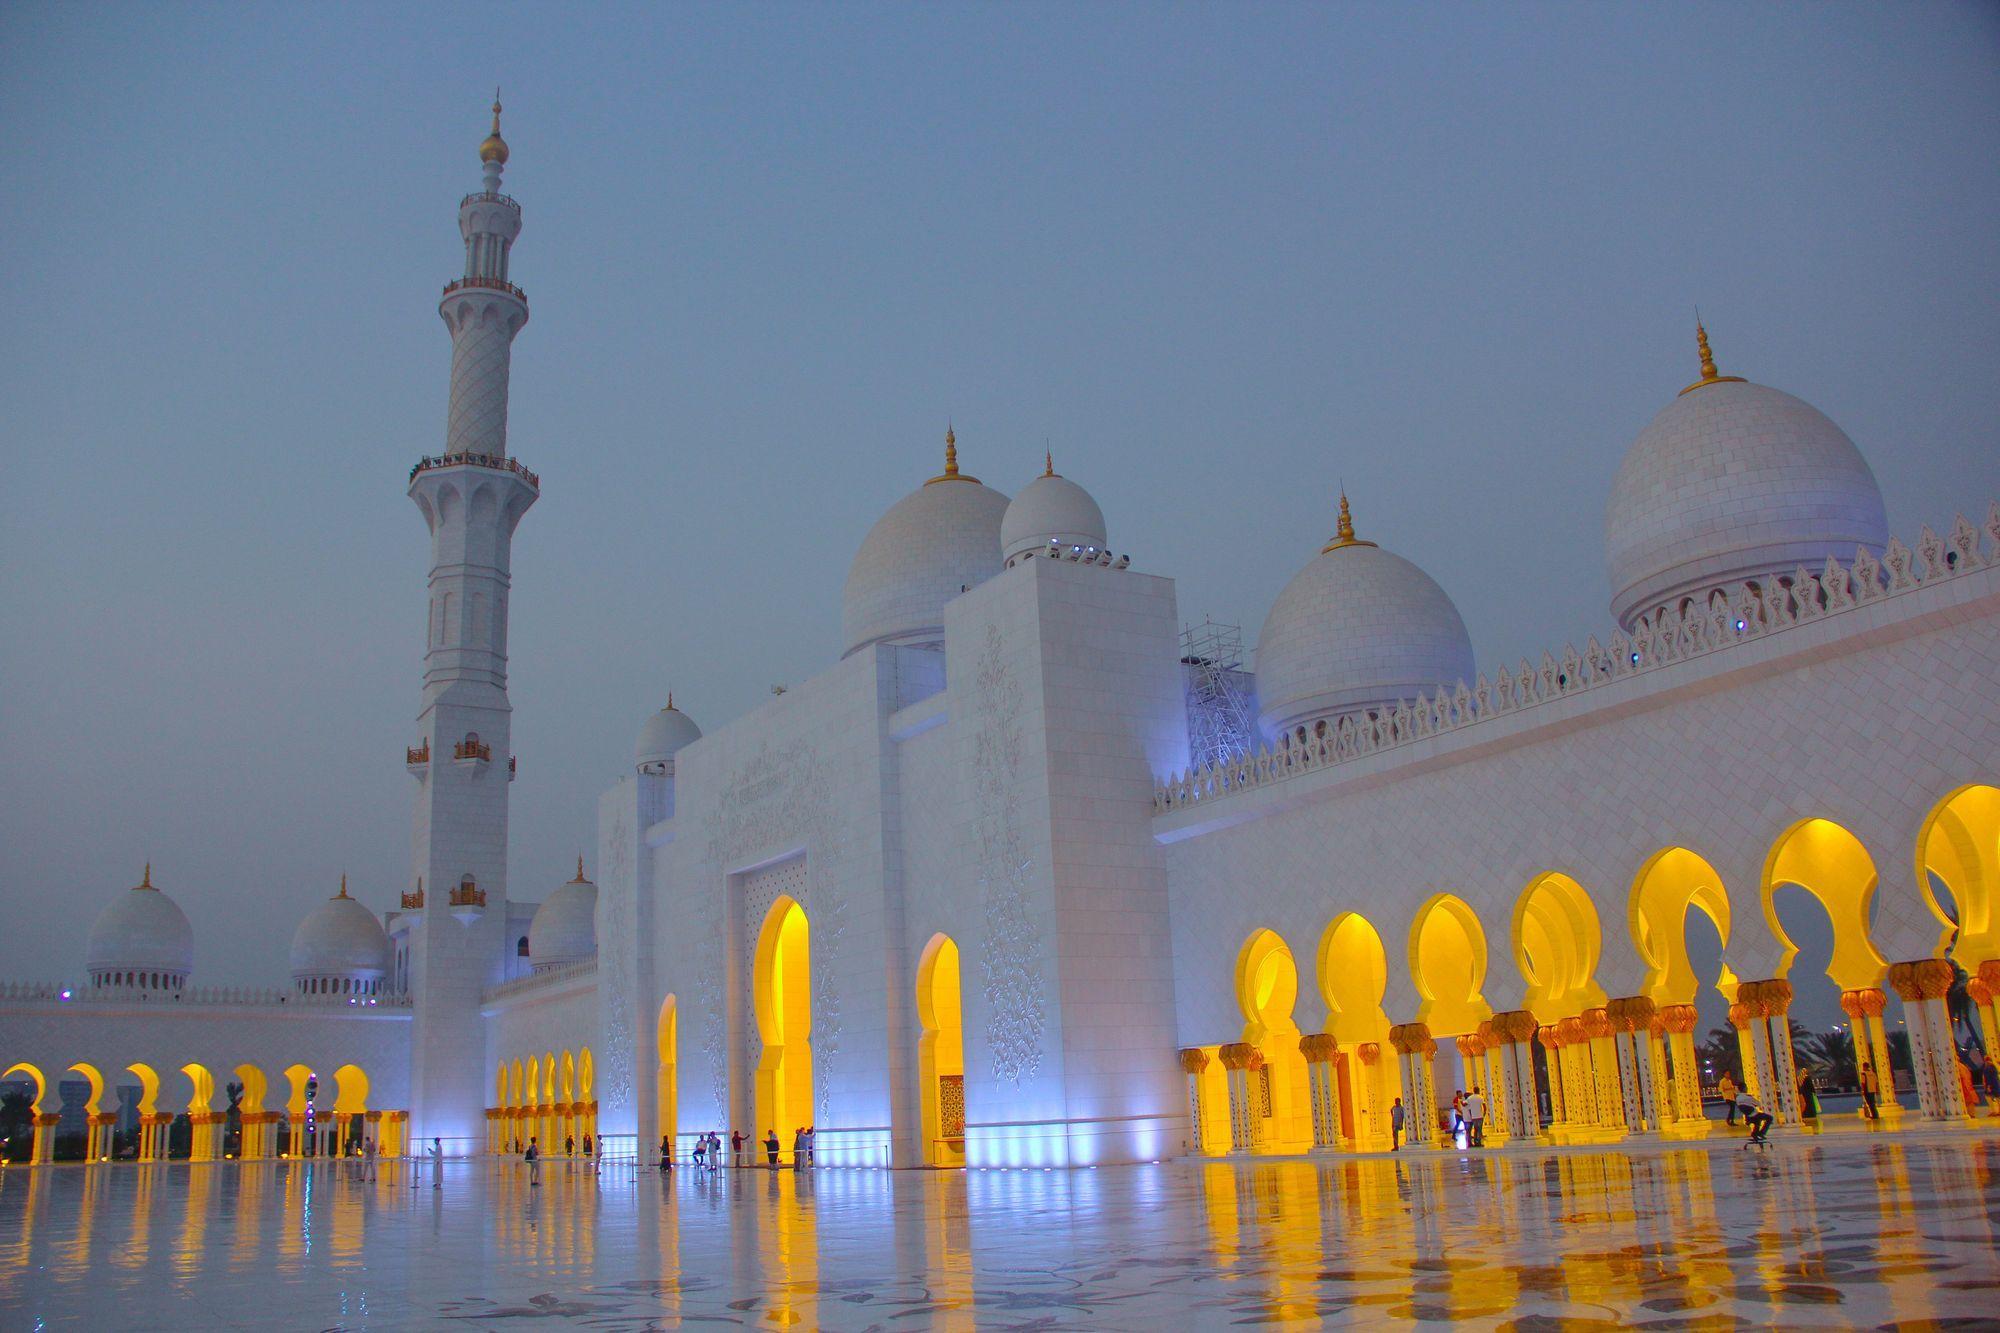 Consumer Behavior On The Month Of Ramadan